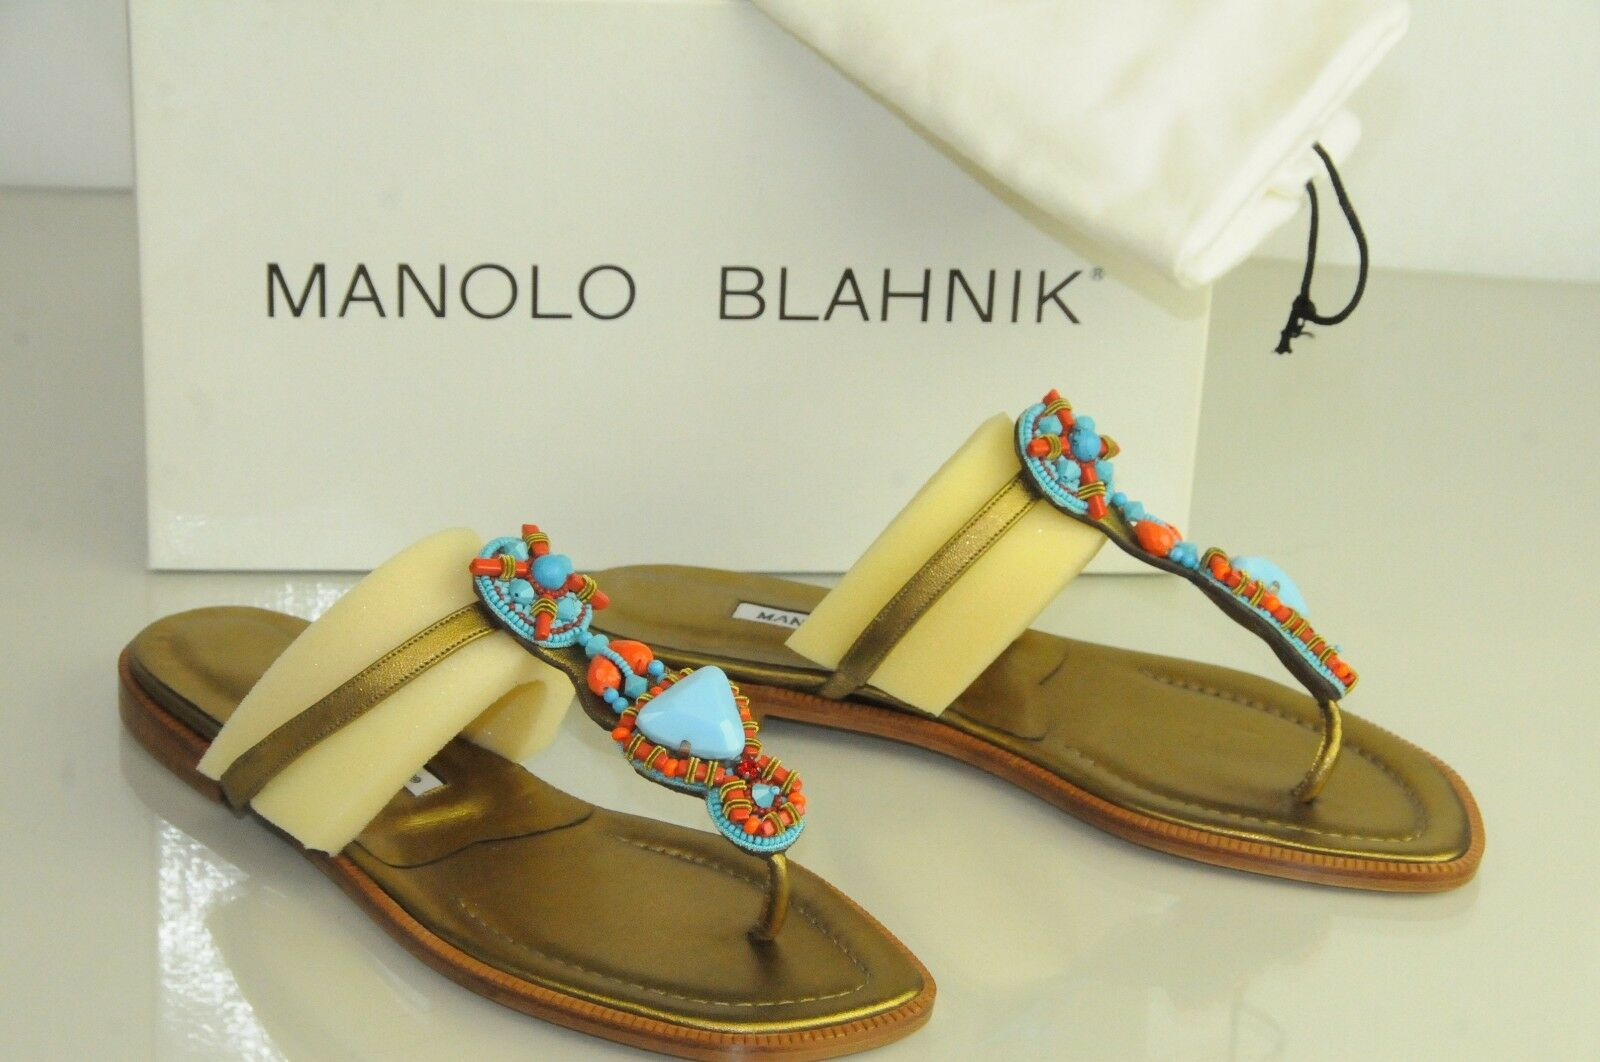 Neuf Manolo Blahnik Boflat Boflat Boflat Bronze Cuir Orné Plats Sandales 41.5 df17b6